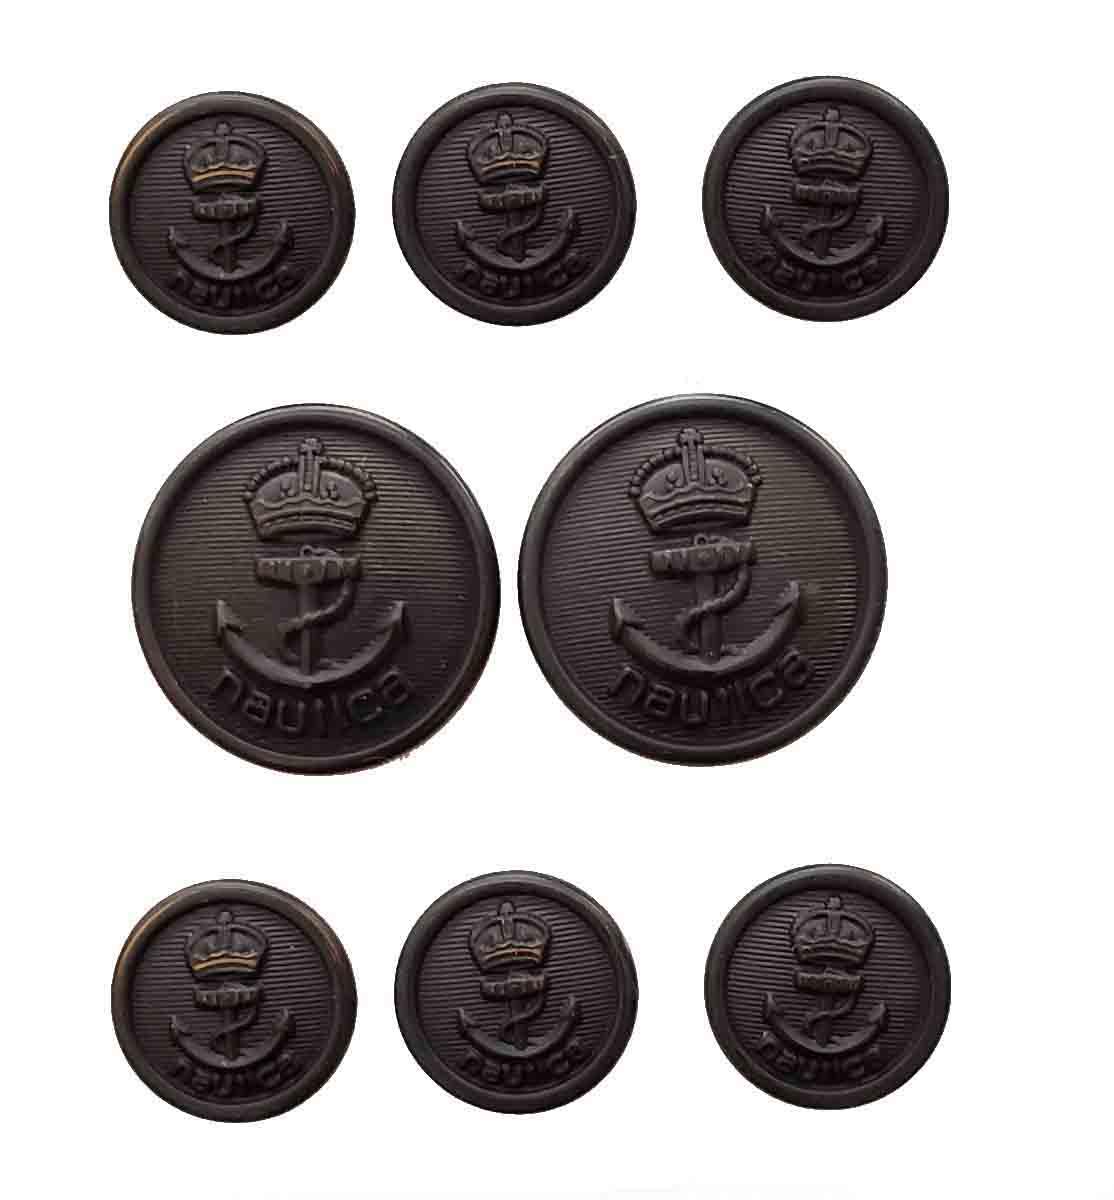 Vintage Nautica by Waterbury Blazer Buttons Set Gray Gold Crown Anchor Men's